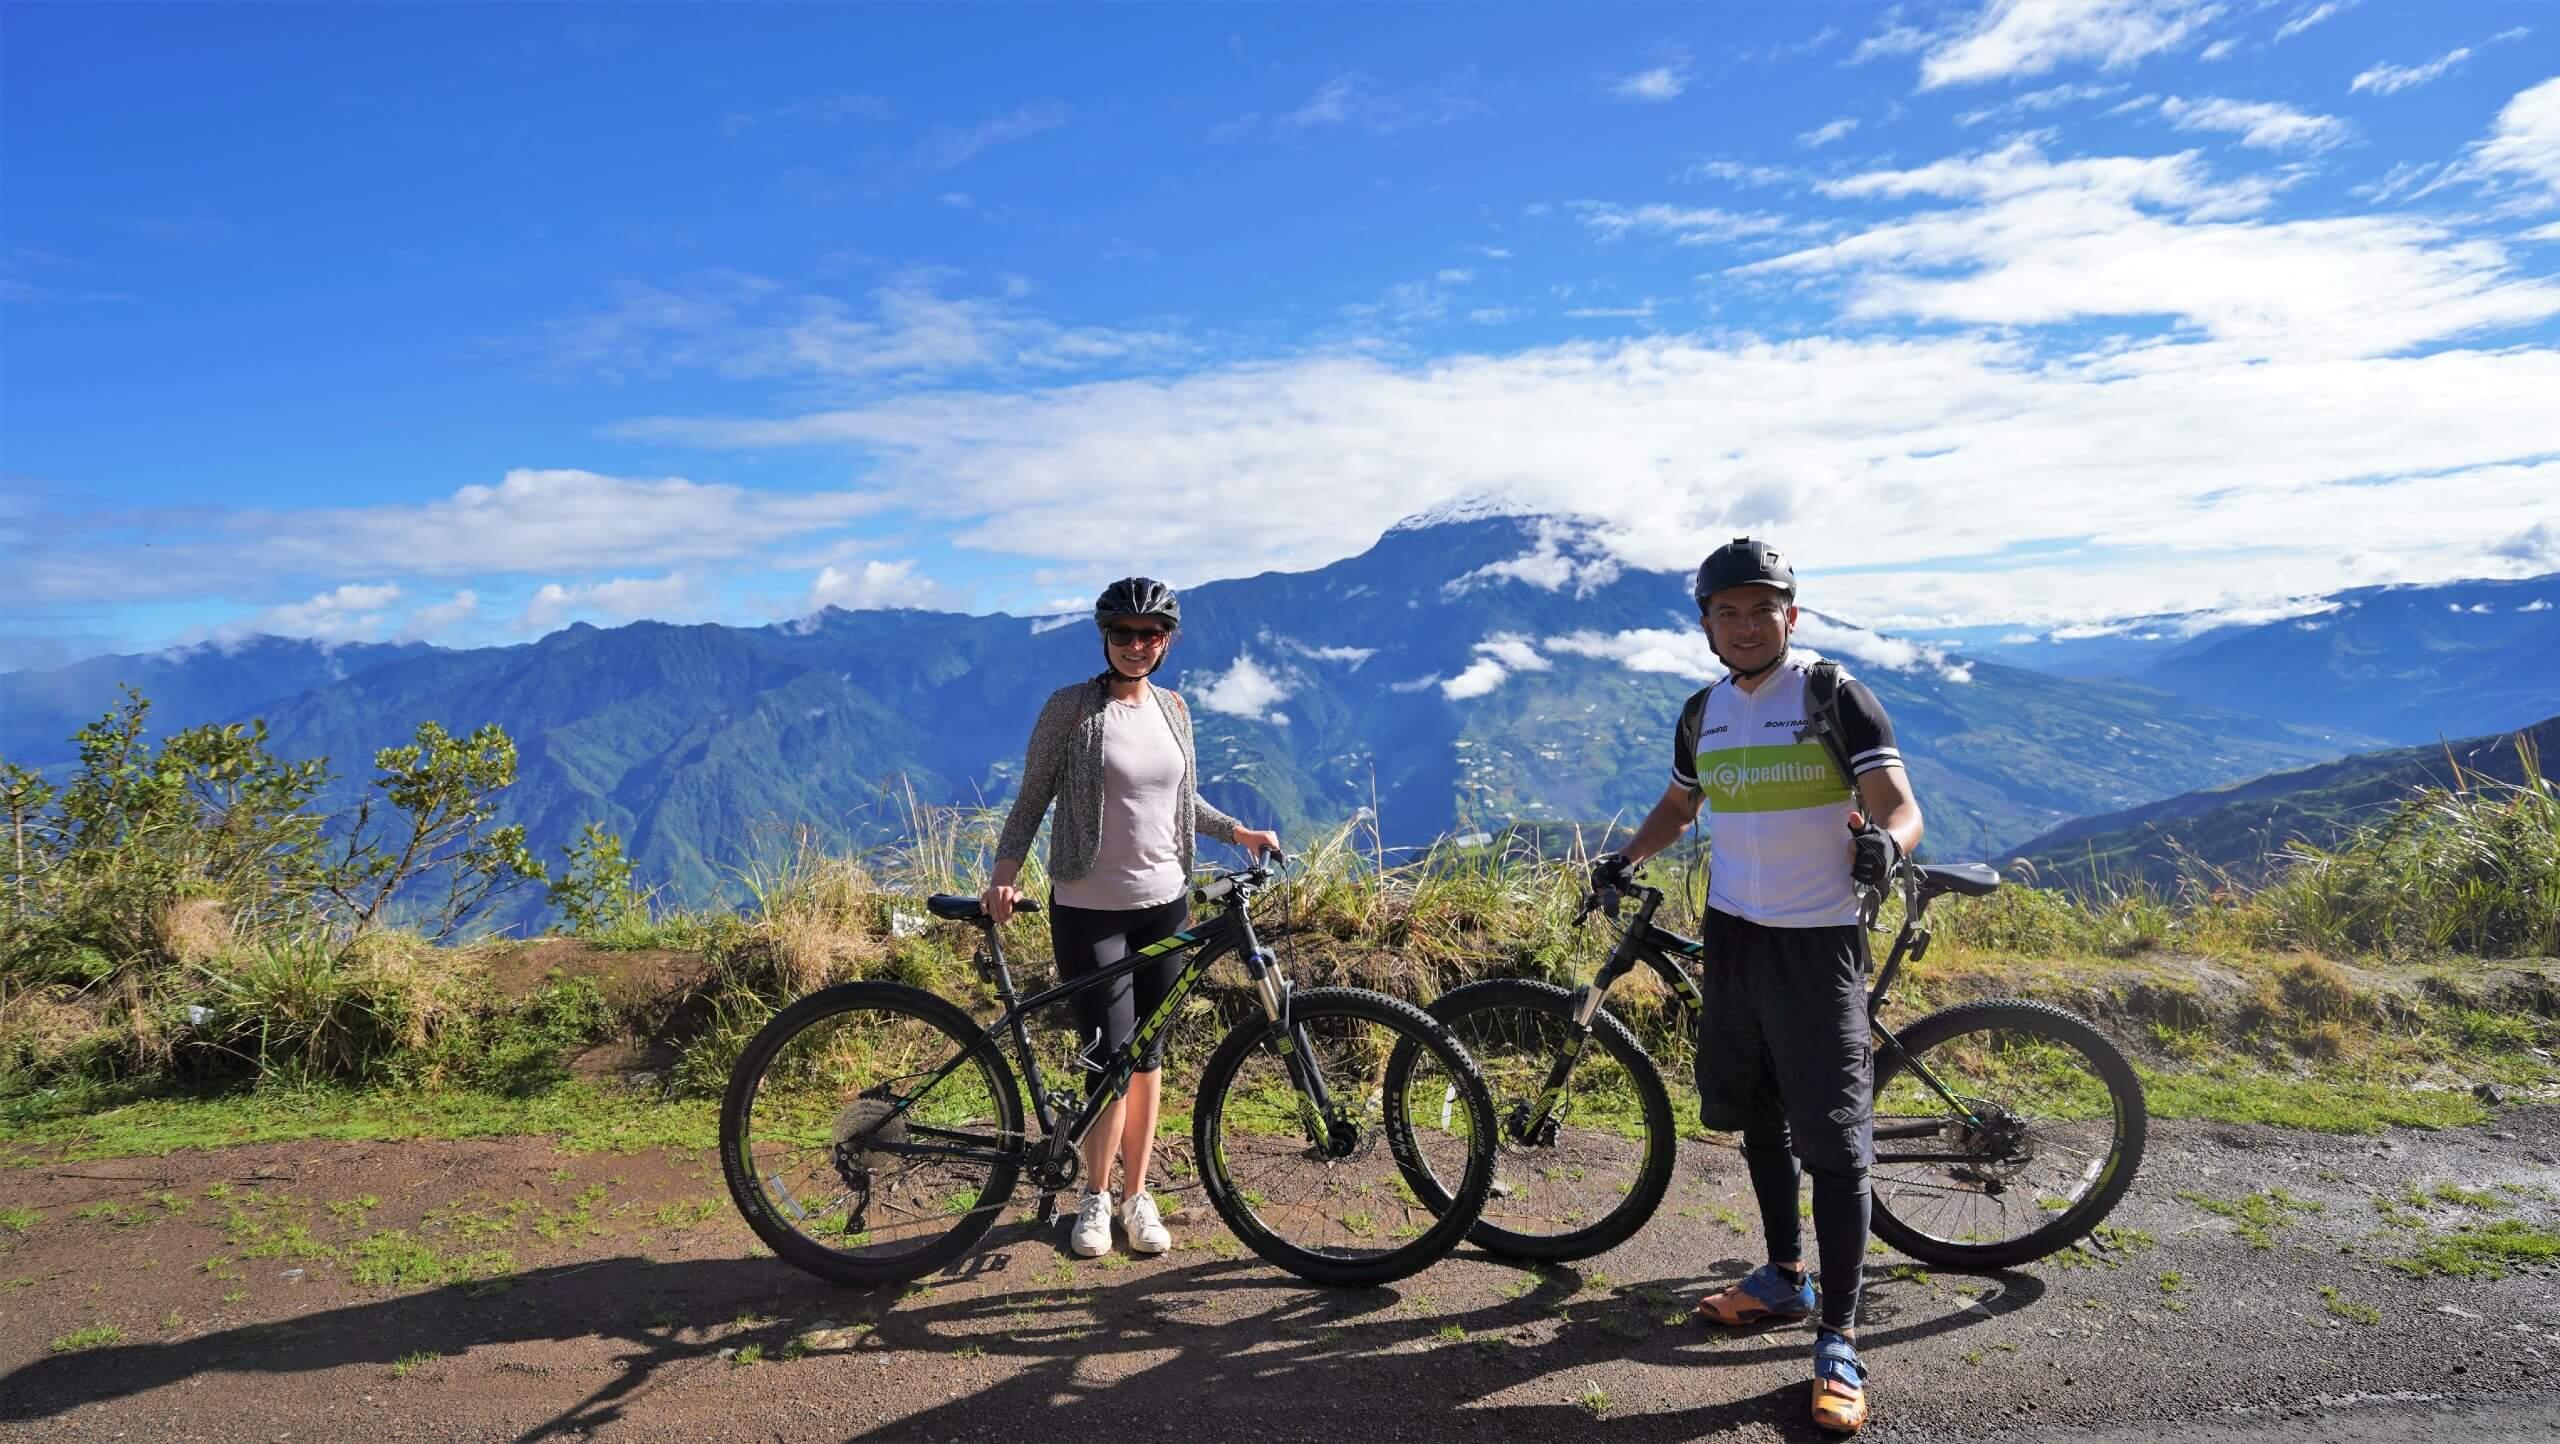 Cyclists posing in front of the mountain view (Ecuador rainforest biking tour)